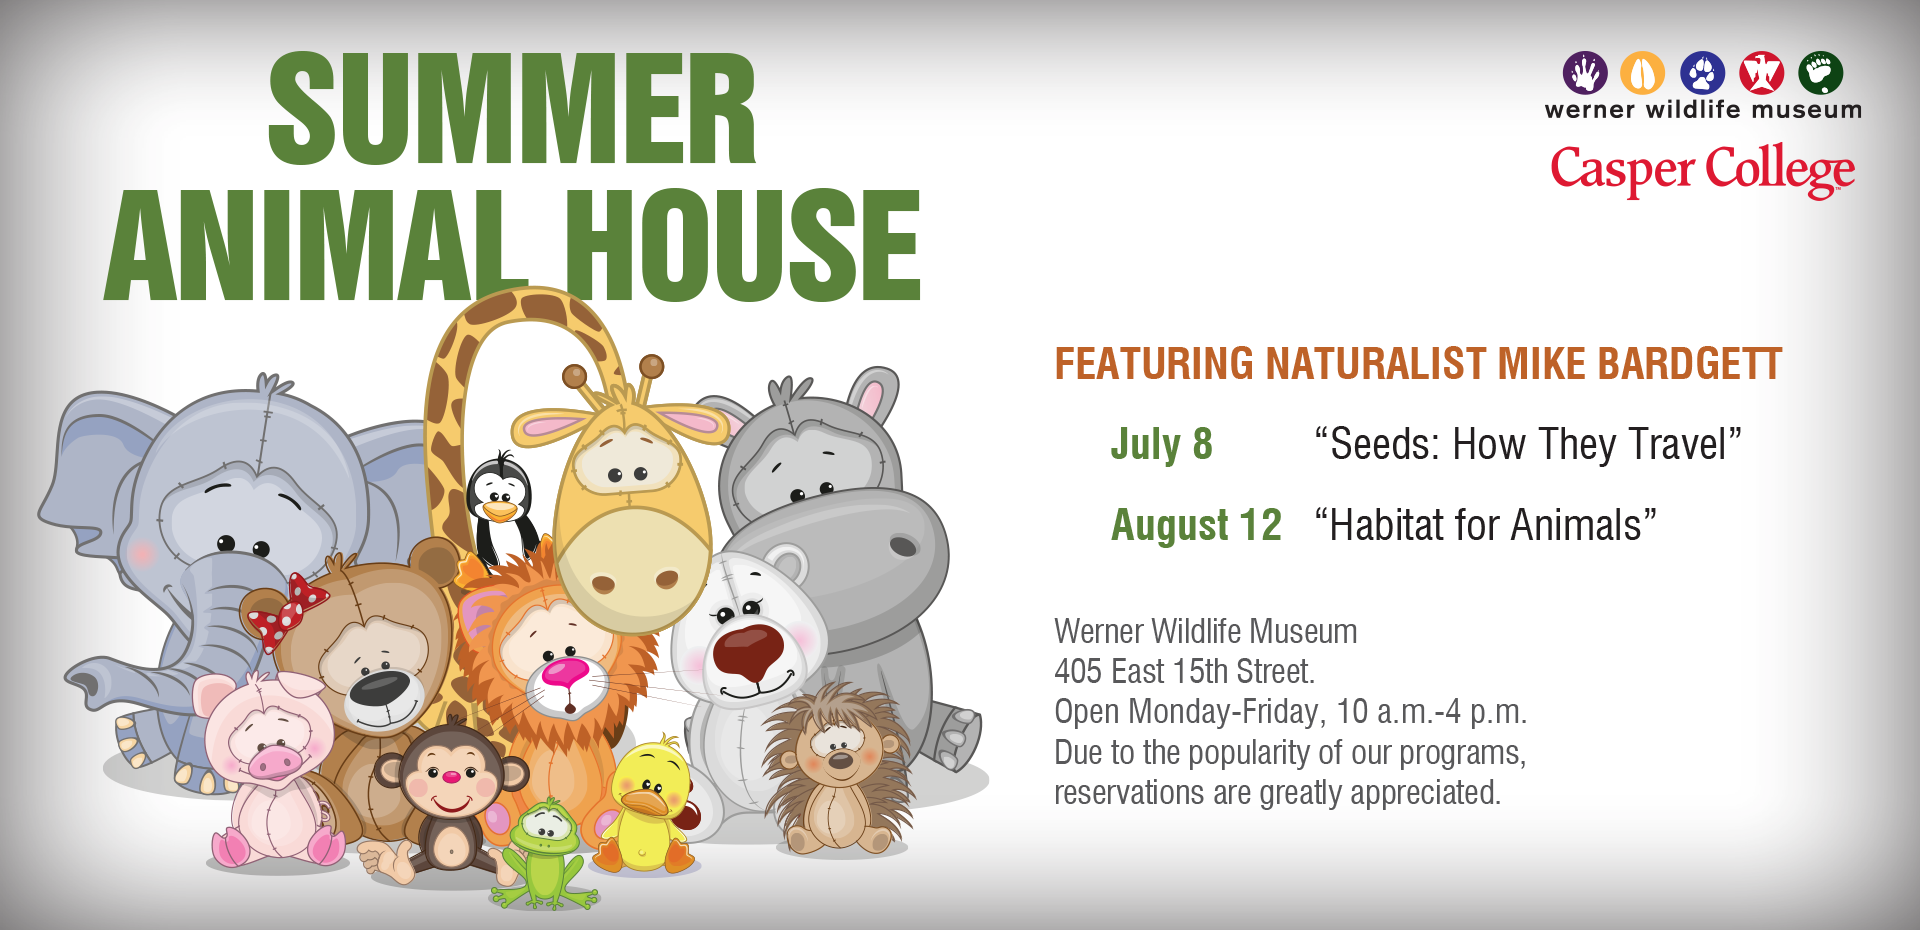 Werner Wildlife Museum Summer Animal House